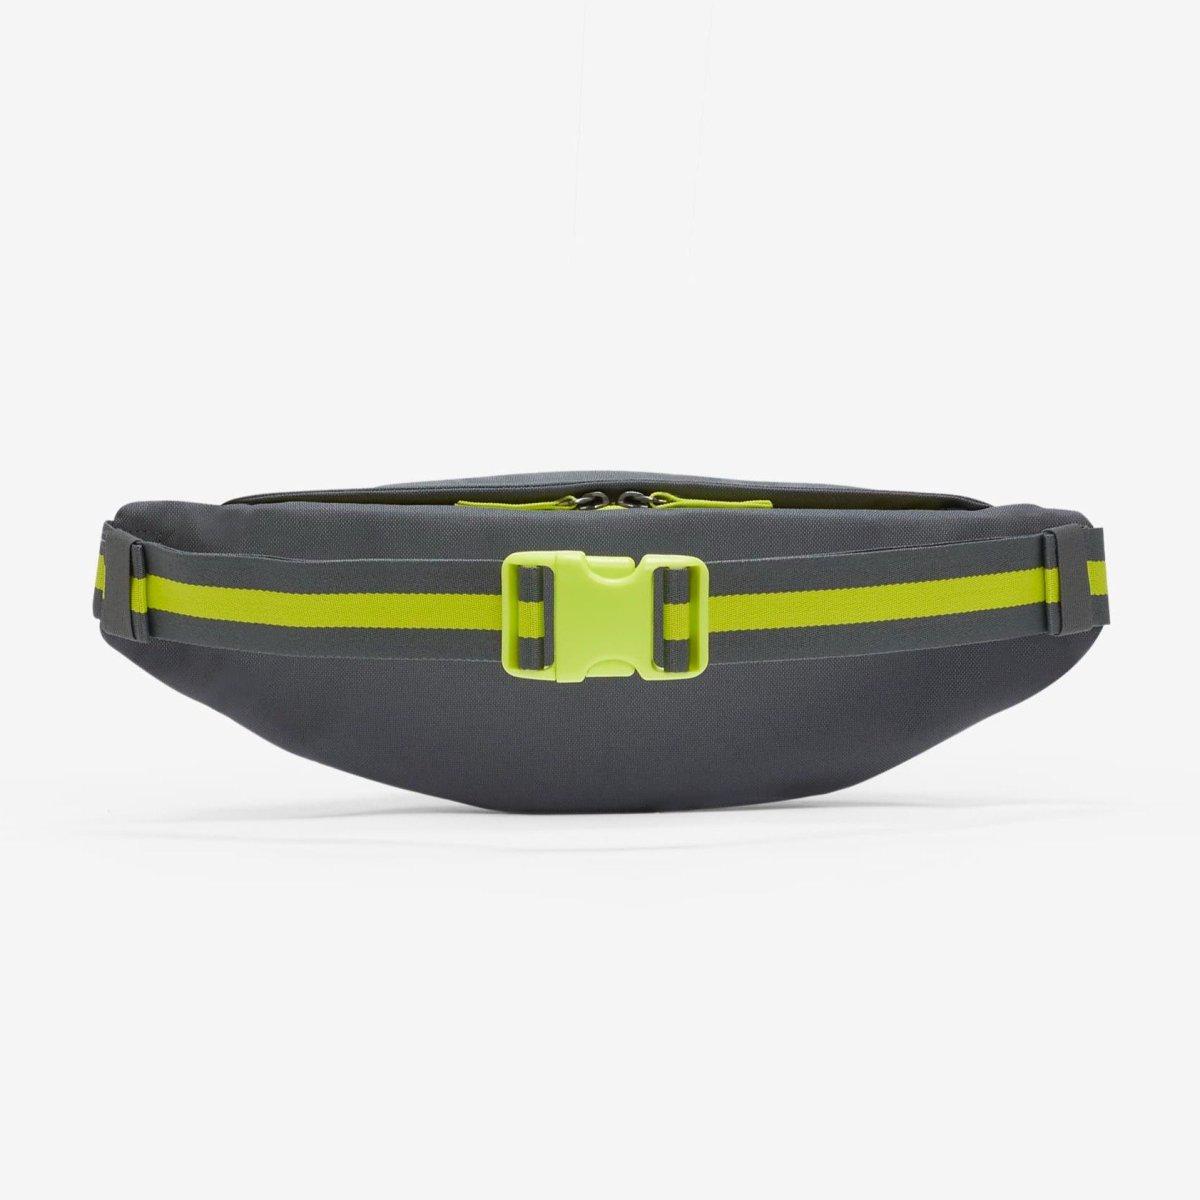 Nike-Heritage-Fanny-pack-Iron-Grey-Cyber-Green-BA5750-068-4_1024x1024@2x